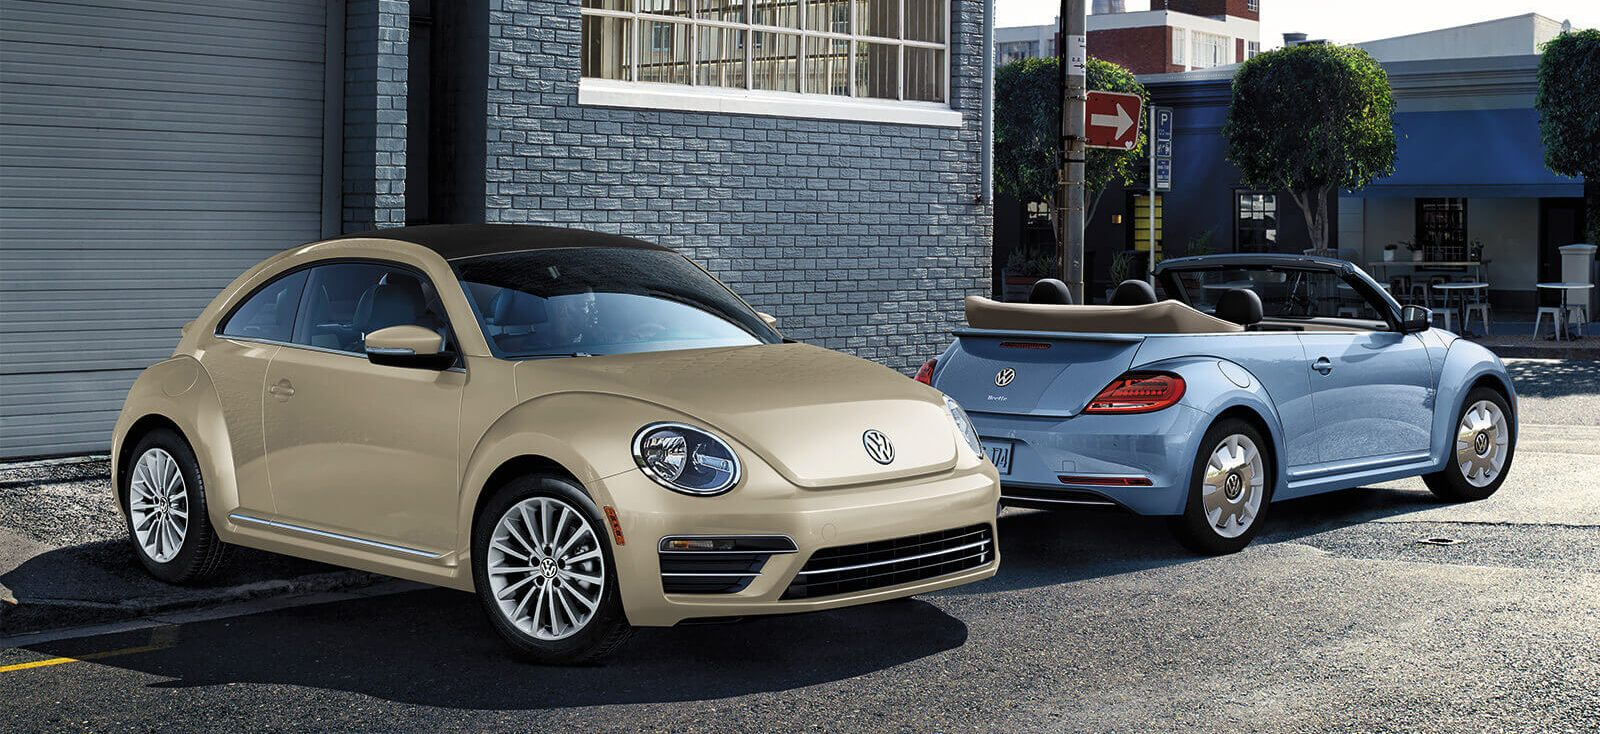 2019 Volkswagen Beetle Leasing near Bethesda, MD